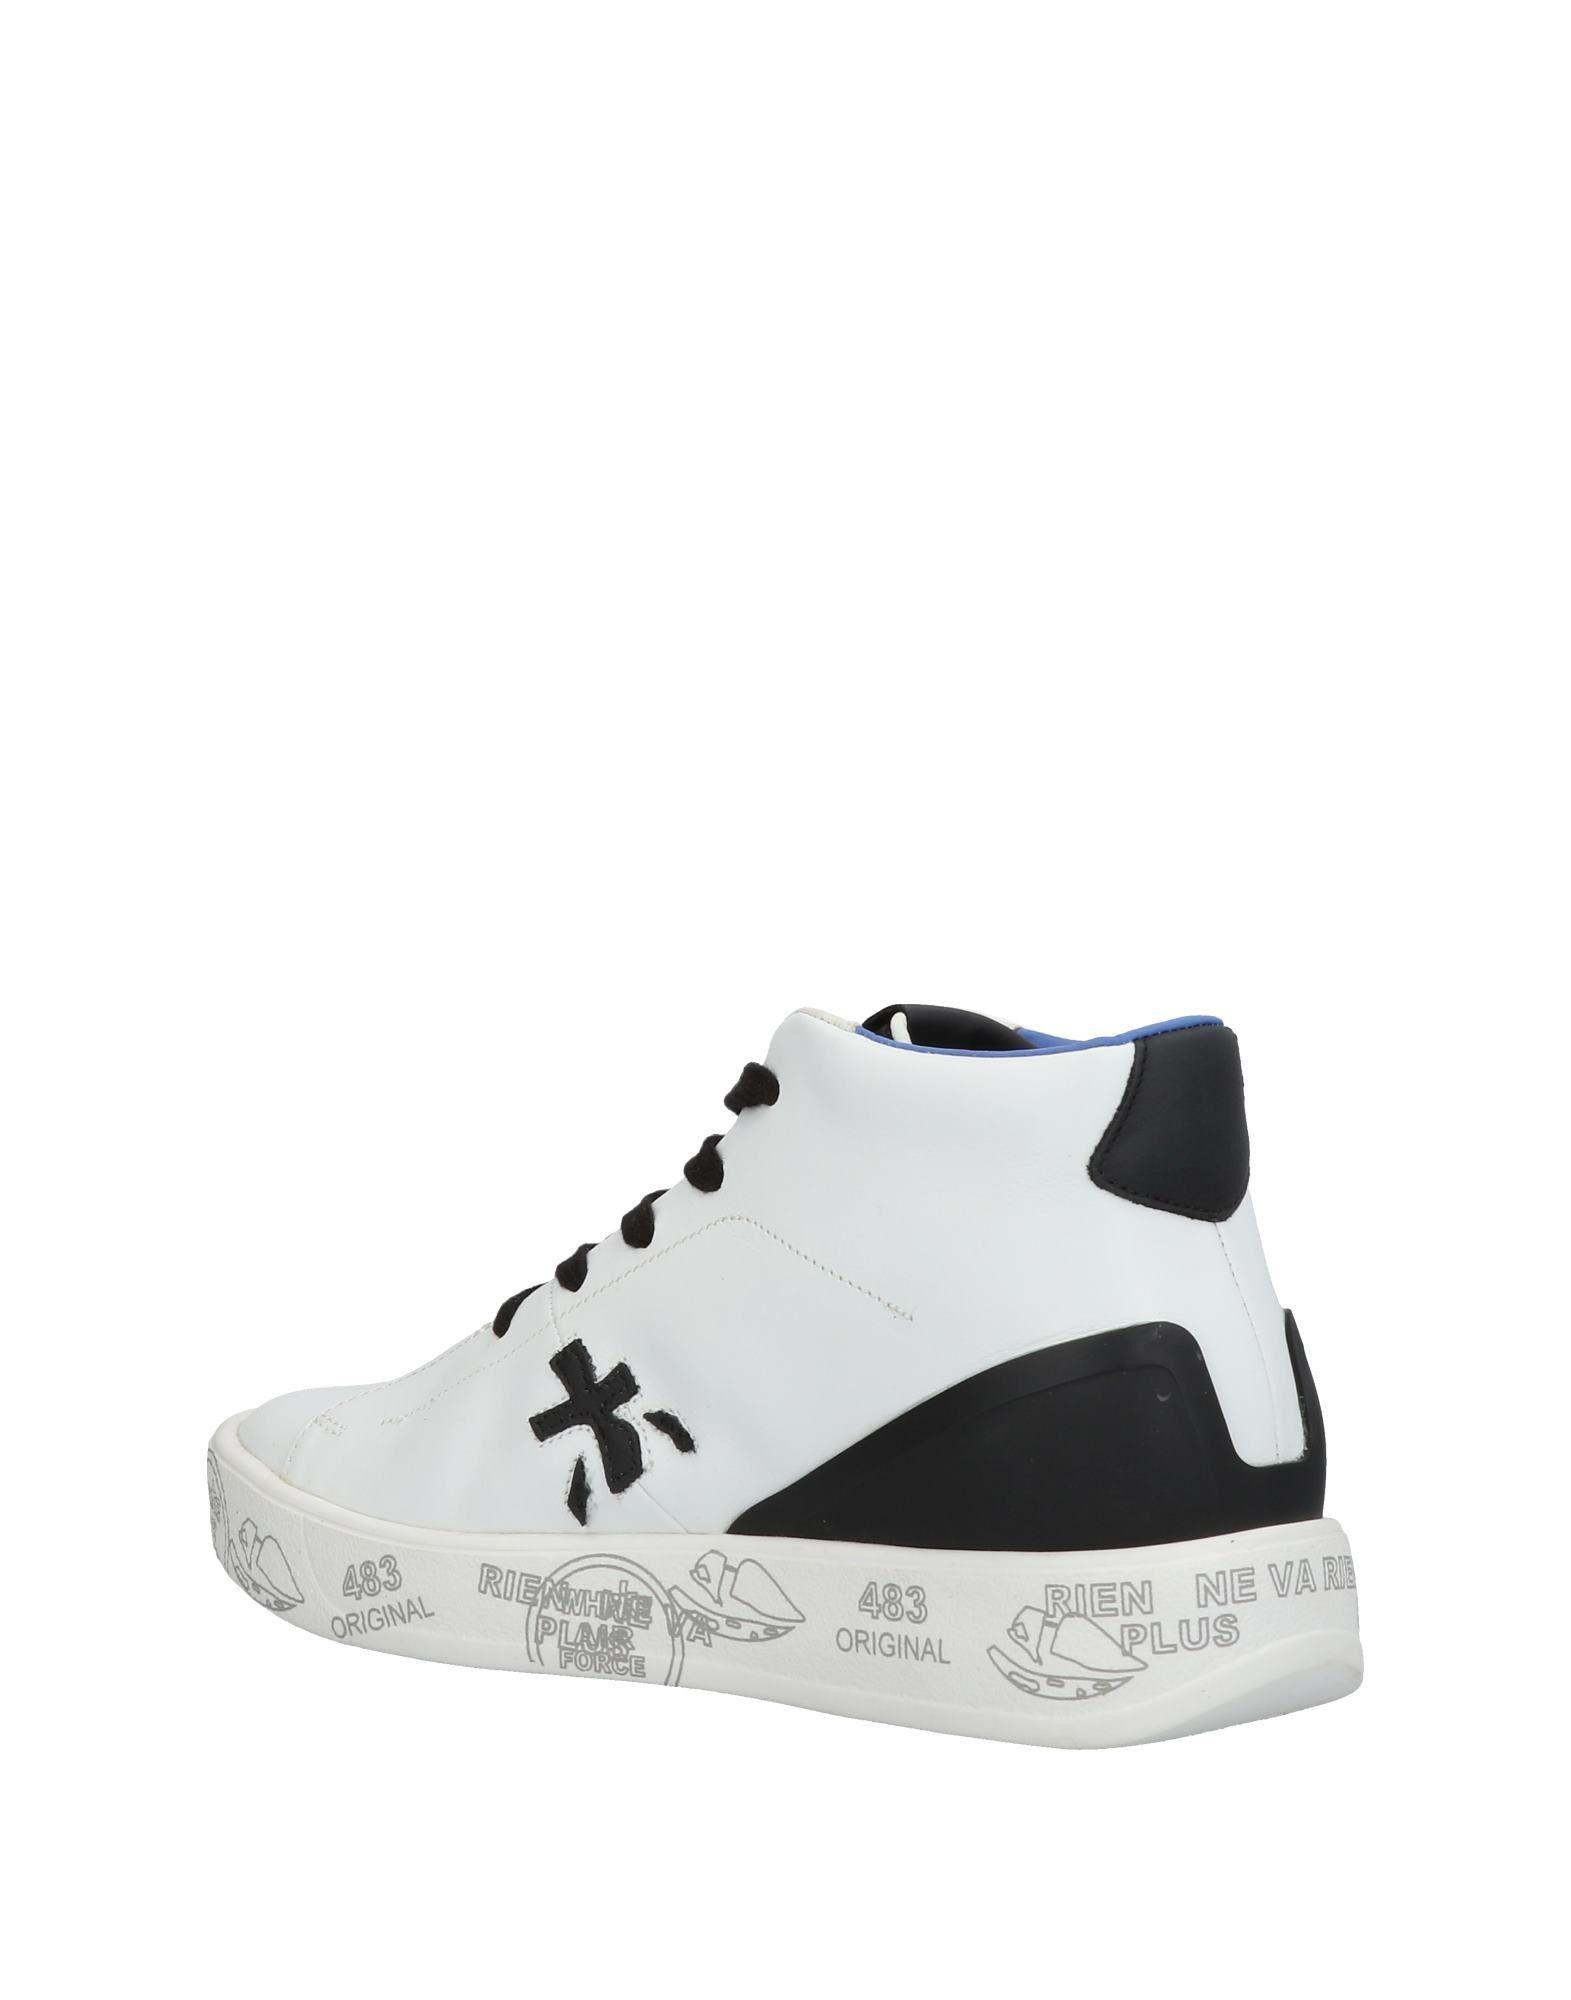 Rabatt echte 11429404MR Schuhe Premiata Sneakers Herren  11429404MR echte 8fddbd